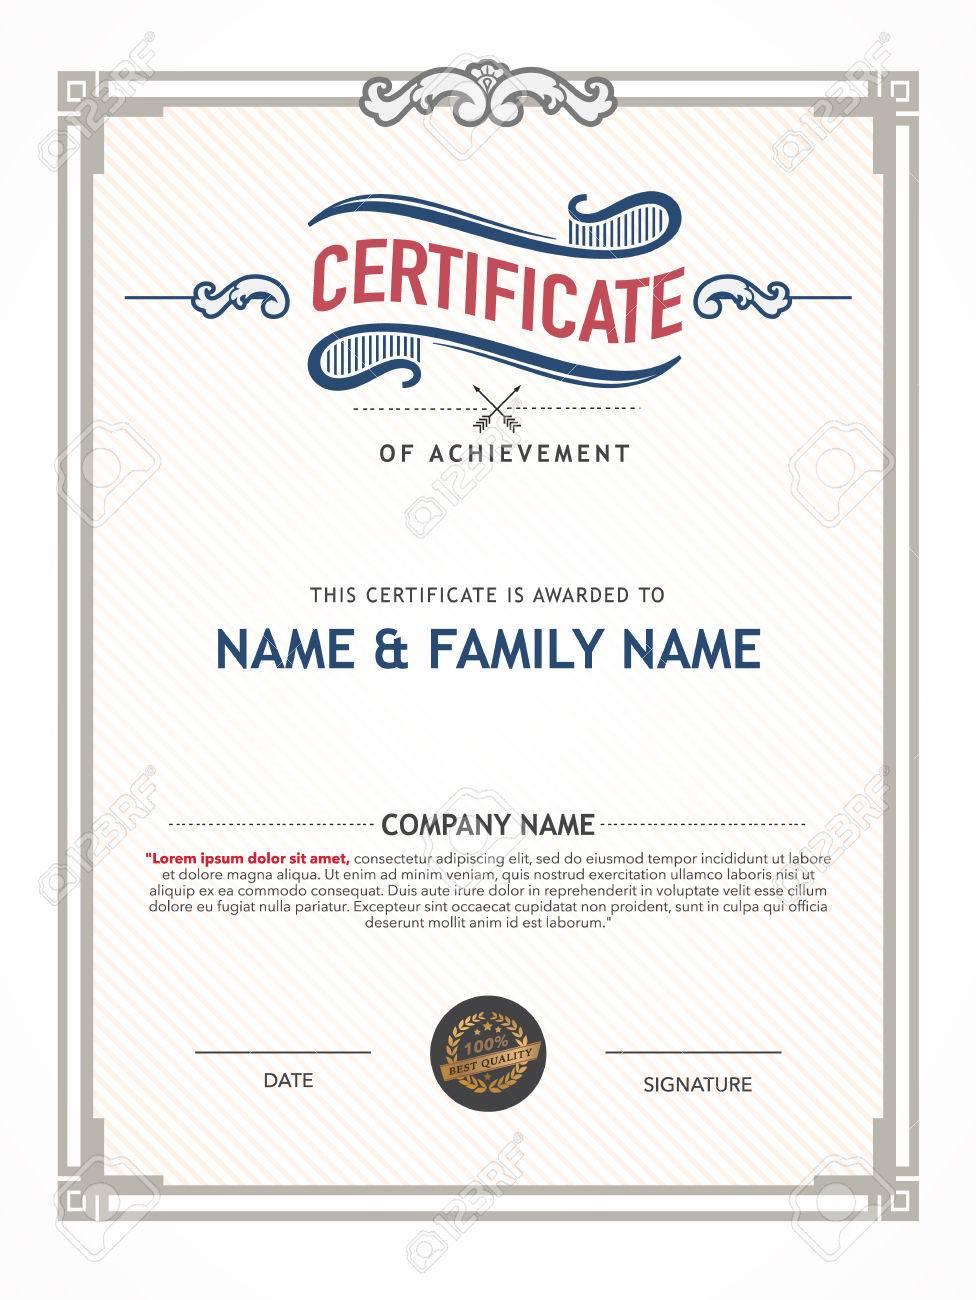 Awesome Blank Zertifikate Vorlage Gift - FORTSETZUNG ARBEITSBLATT ...